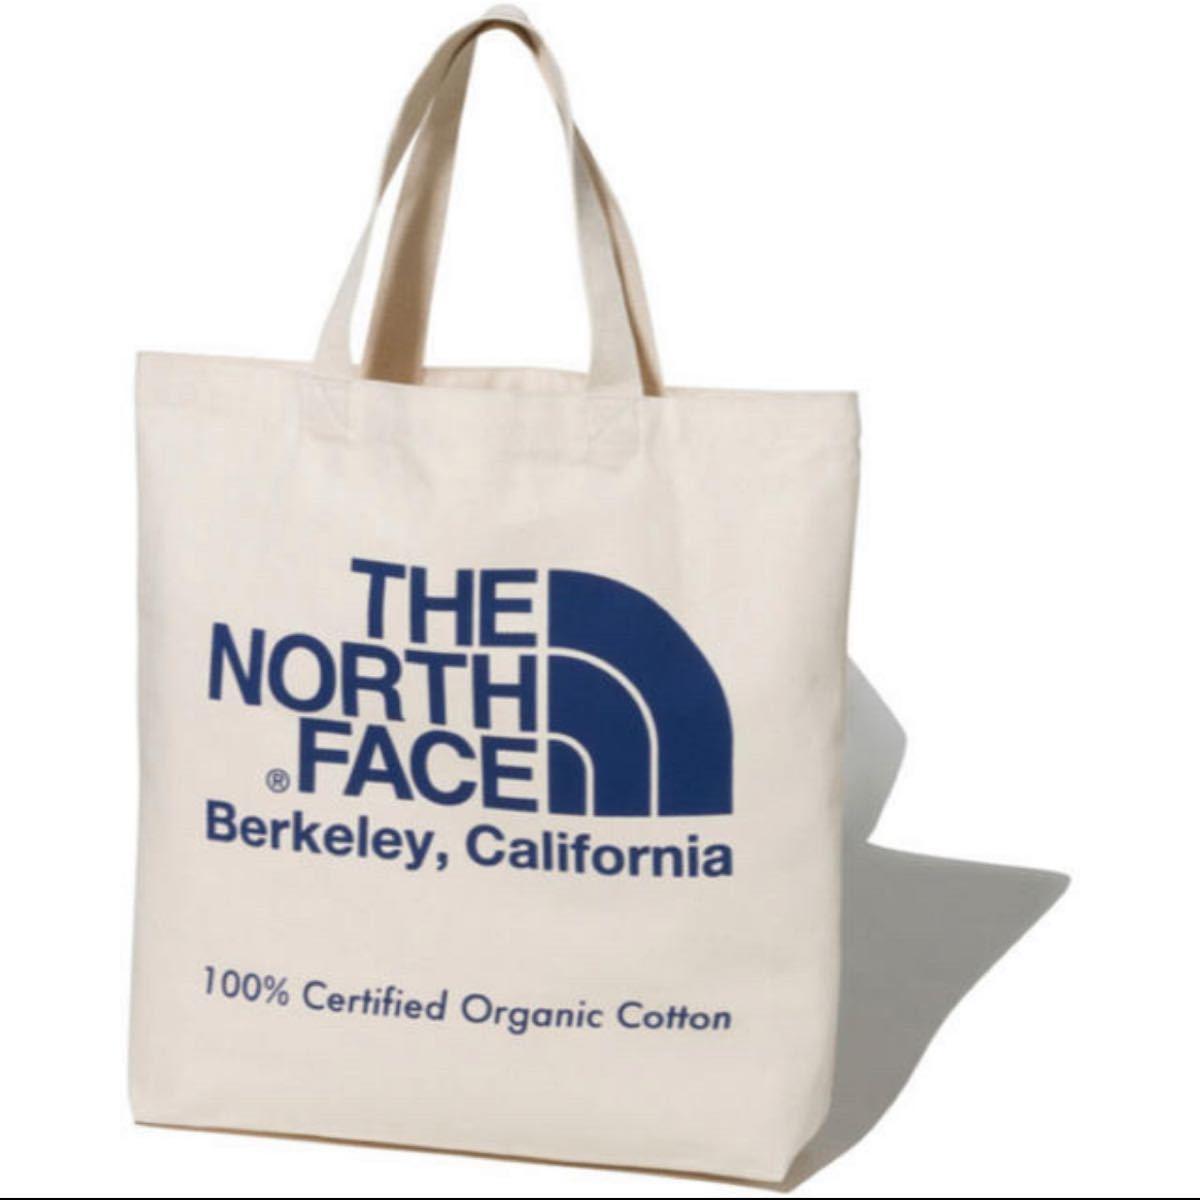 THE NORTH FACE オーガニックコットン ノースフェイストートバッグ ザ・ノース・フェイス トートバッグ